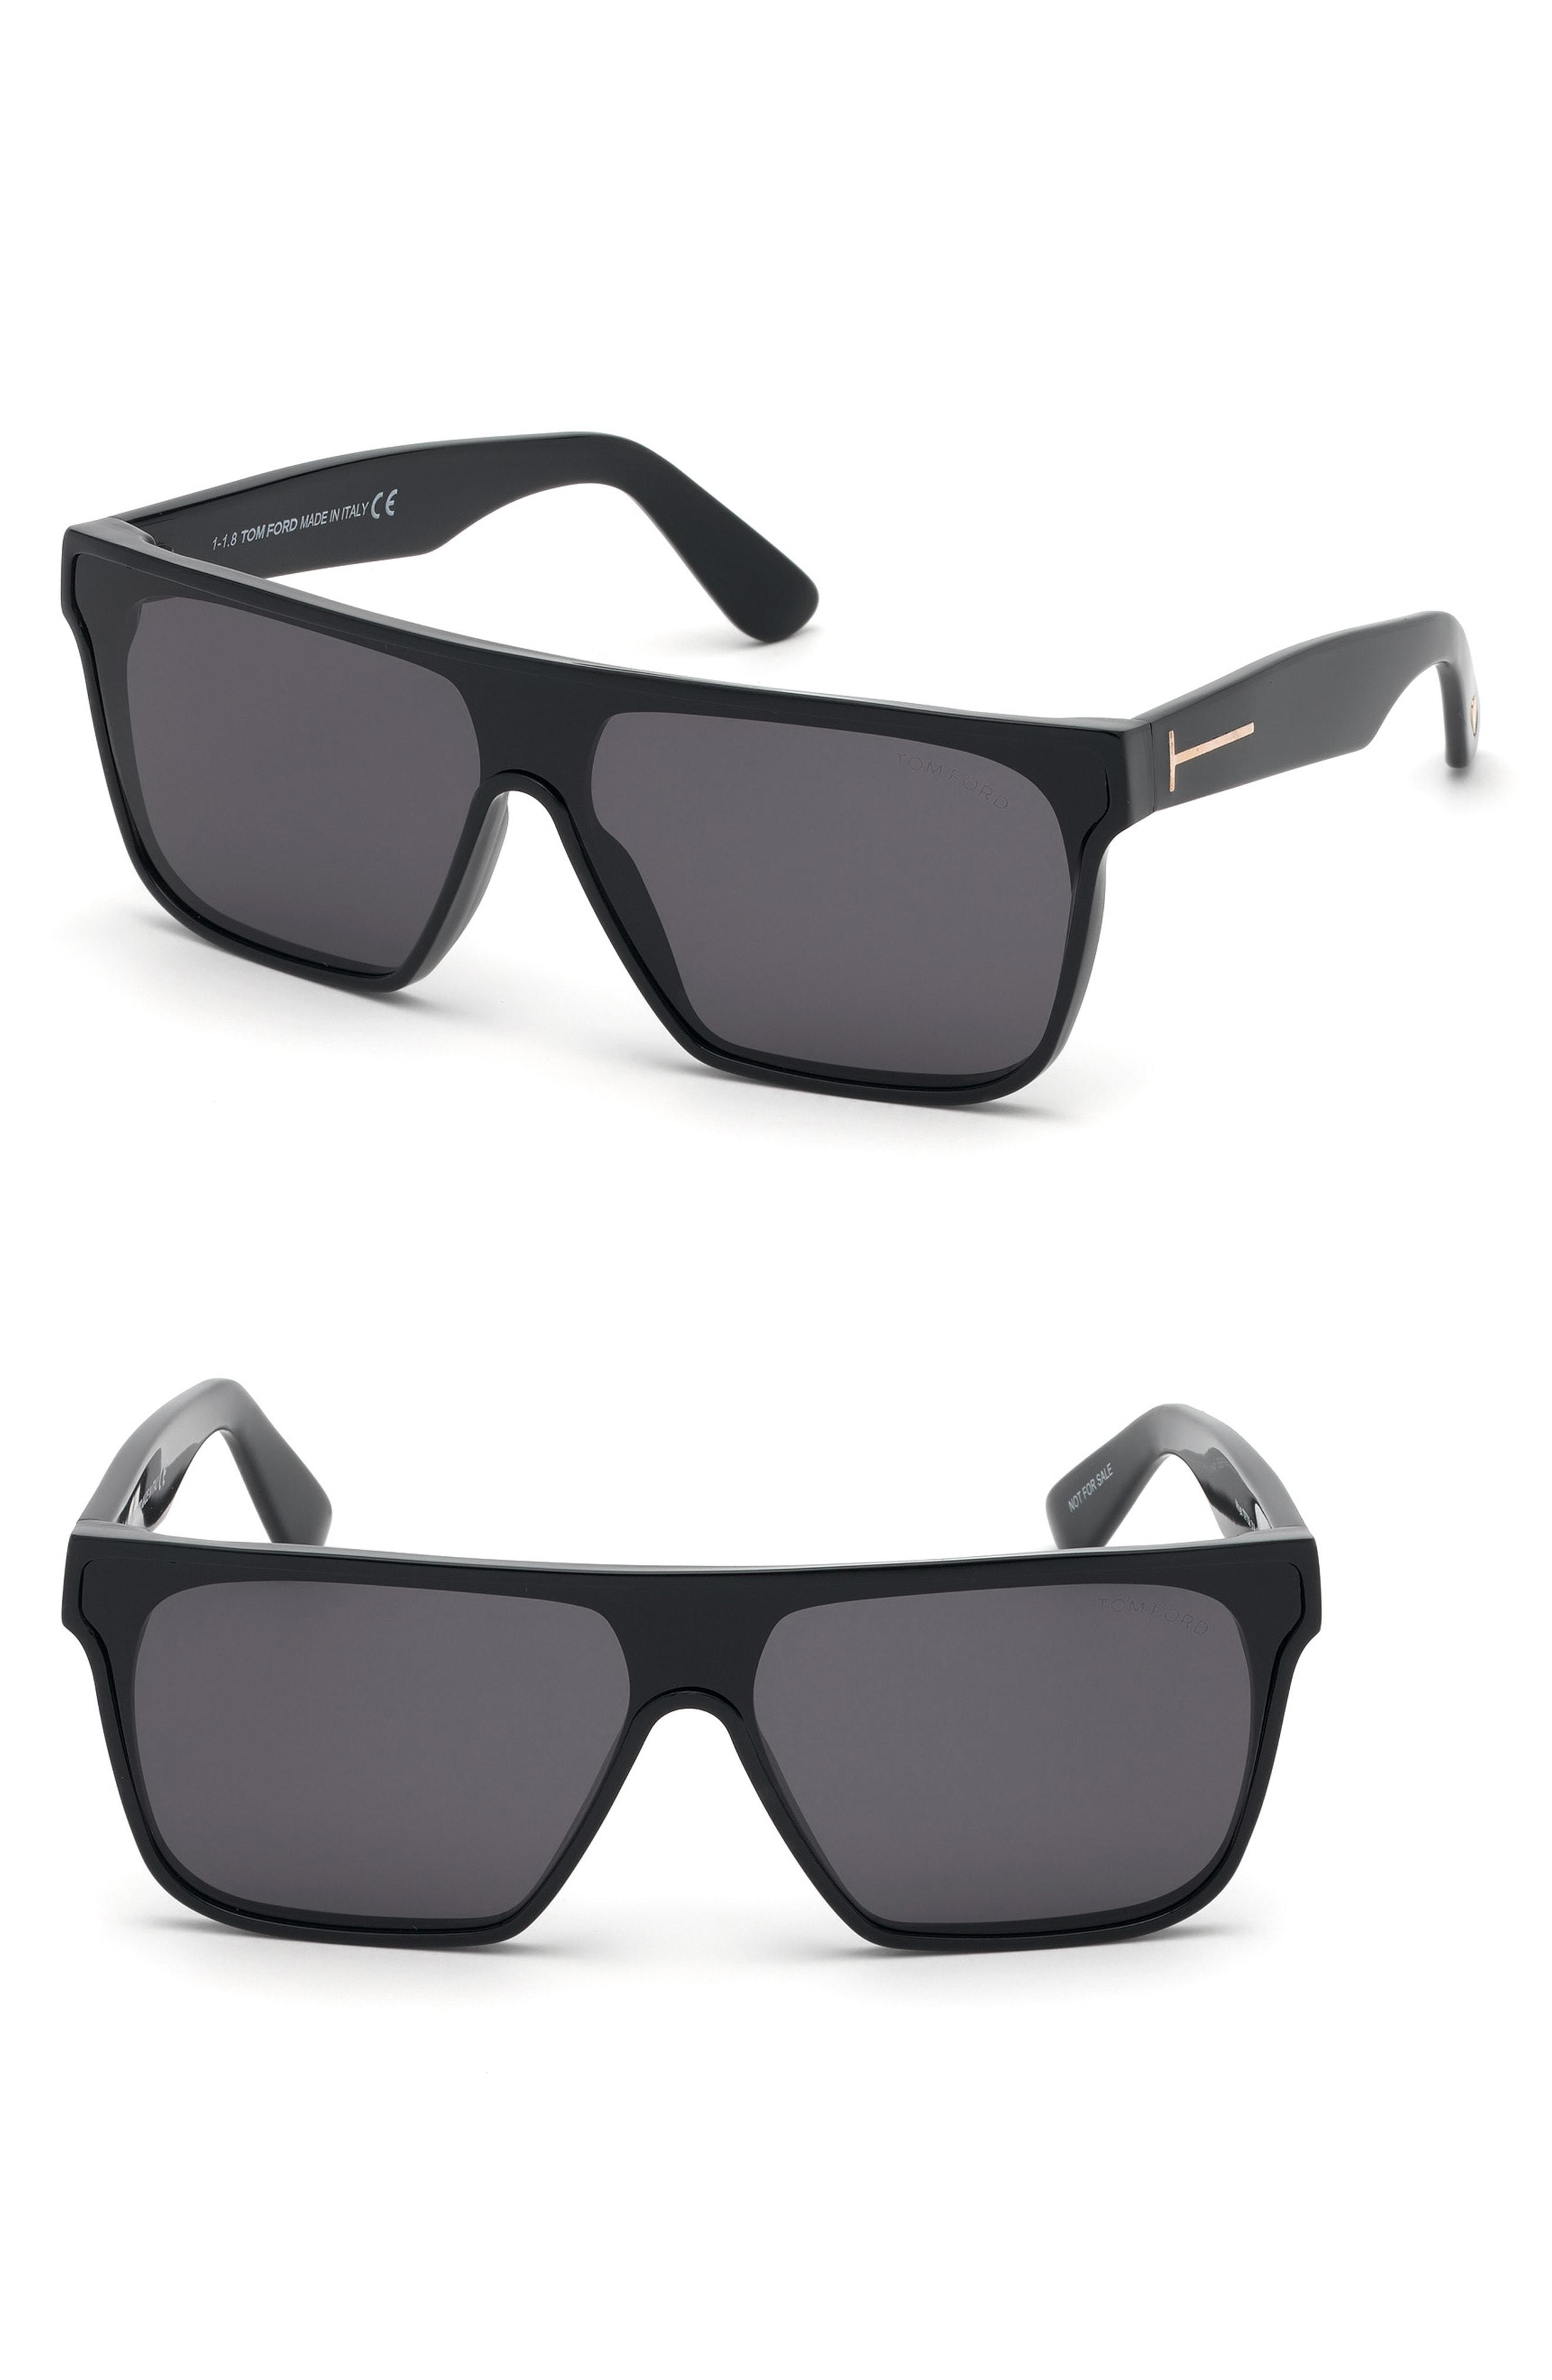 2de083091e7 Lyst - Tom Ford 140mm Shield Sunglasses - for Men